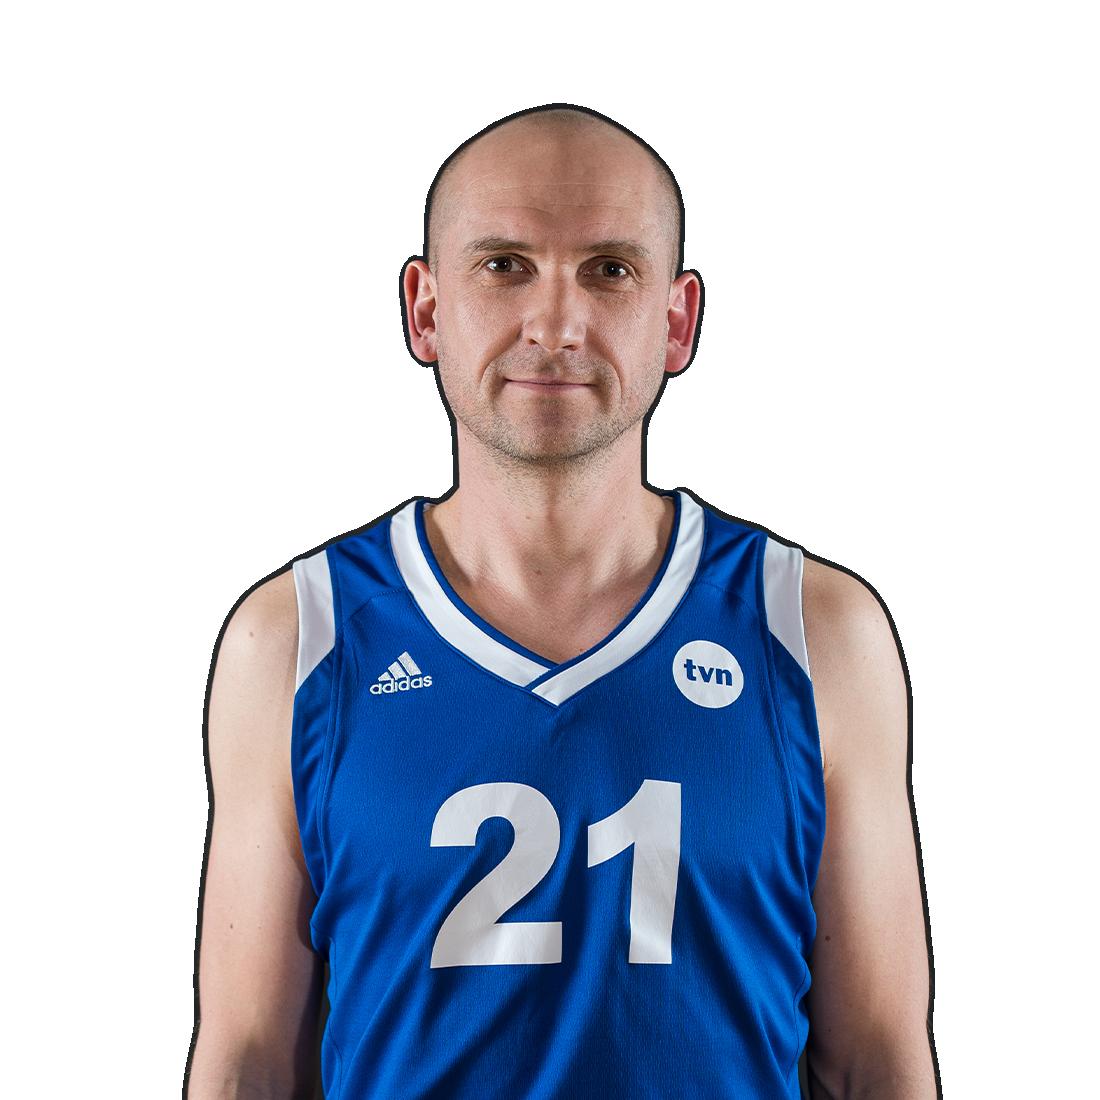 Tomasz Sałaga